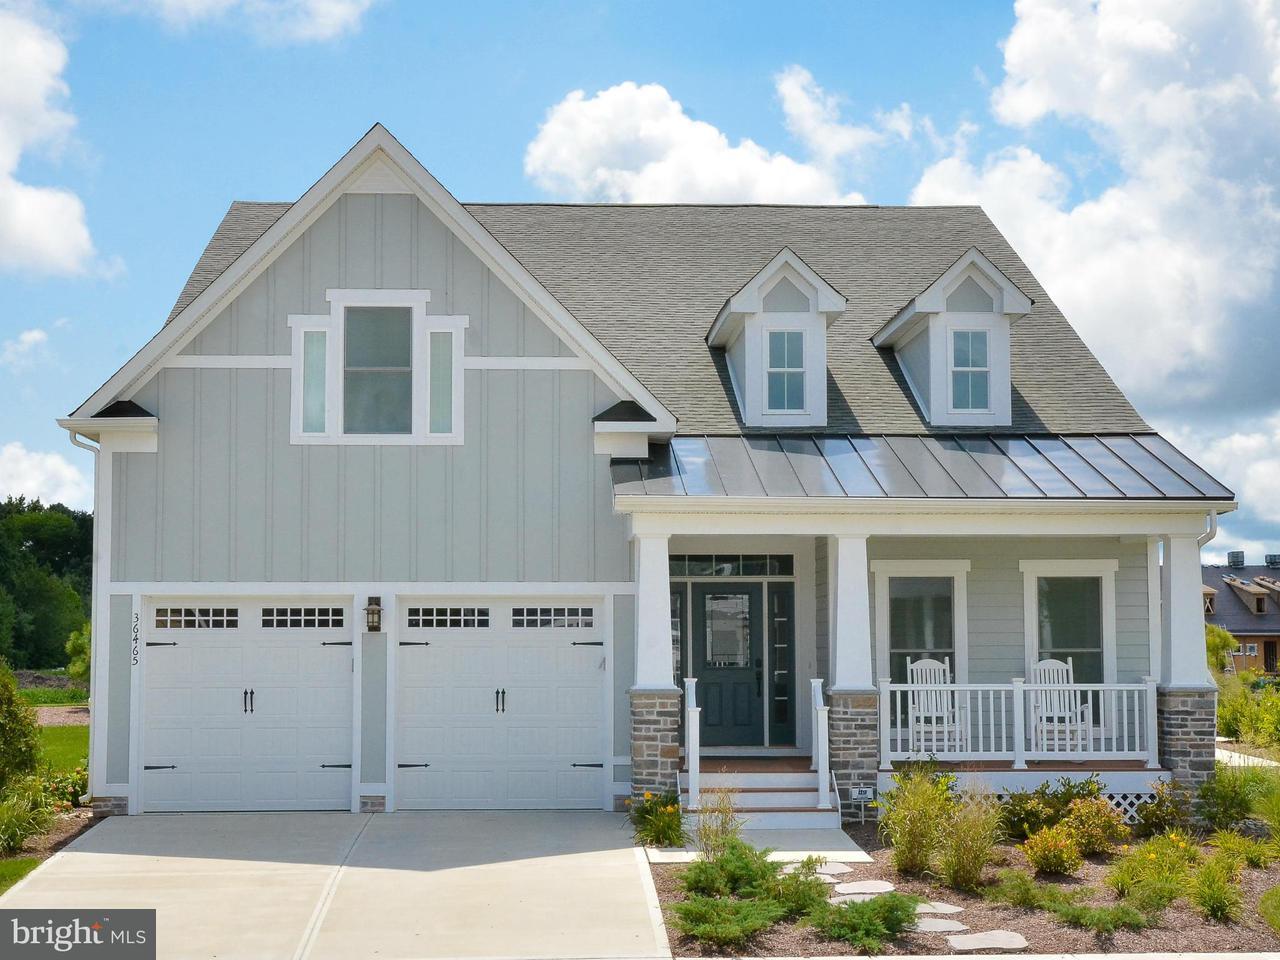 Casa Unifamiliar por un Venta en 3016 TURNSTILE Lane 3016 TURNSTILE Lane Odenton, Maryland 21113 Estados Unidos